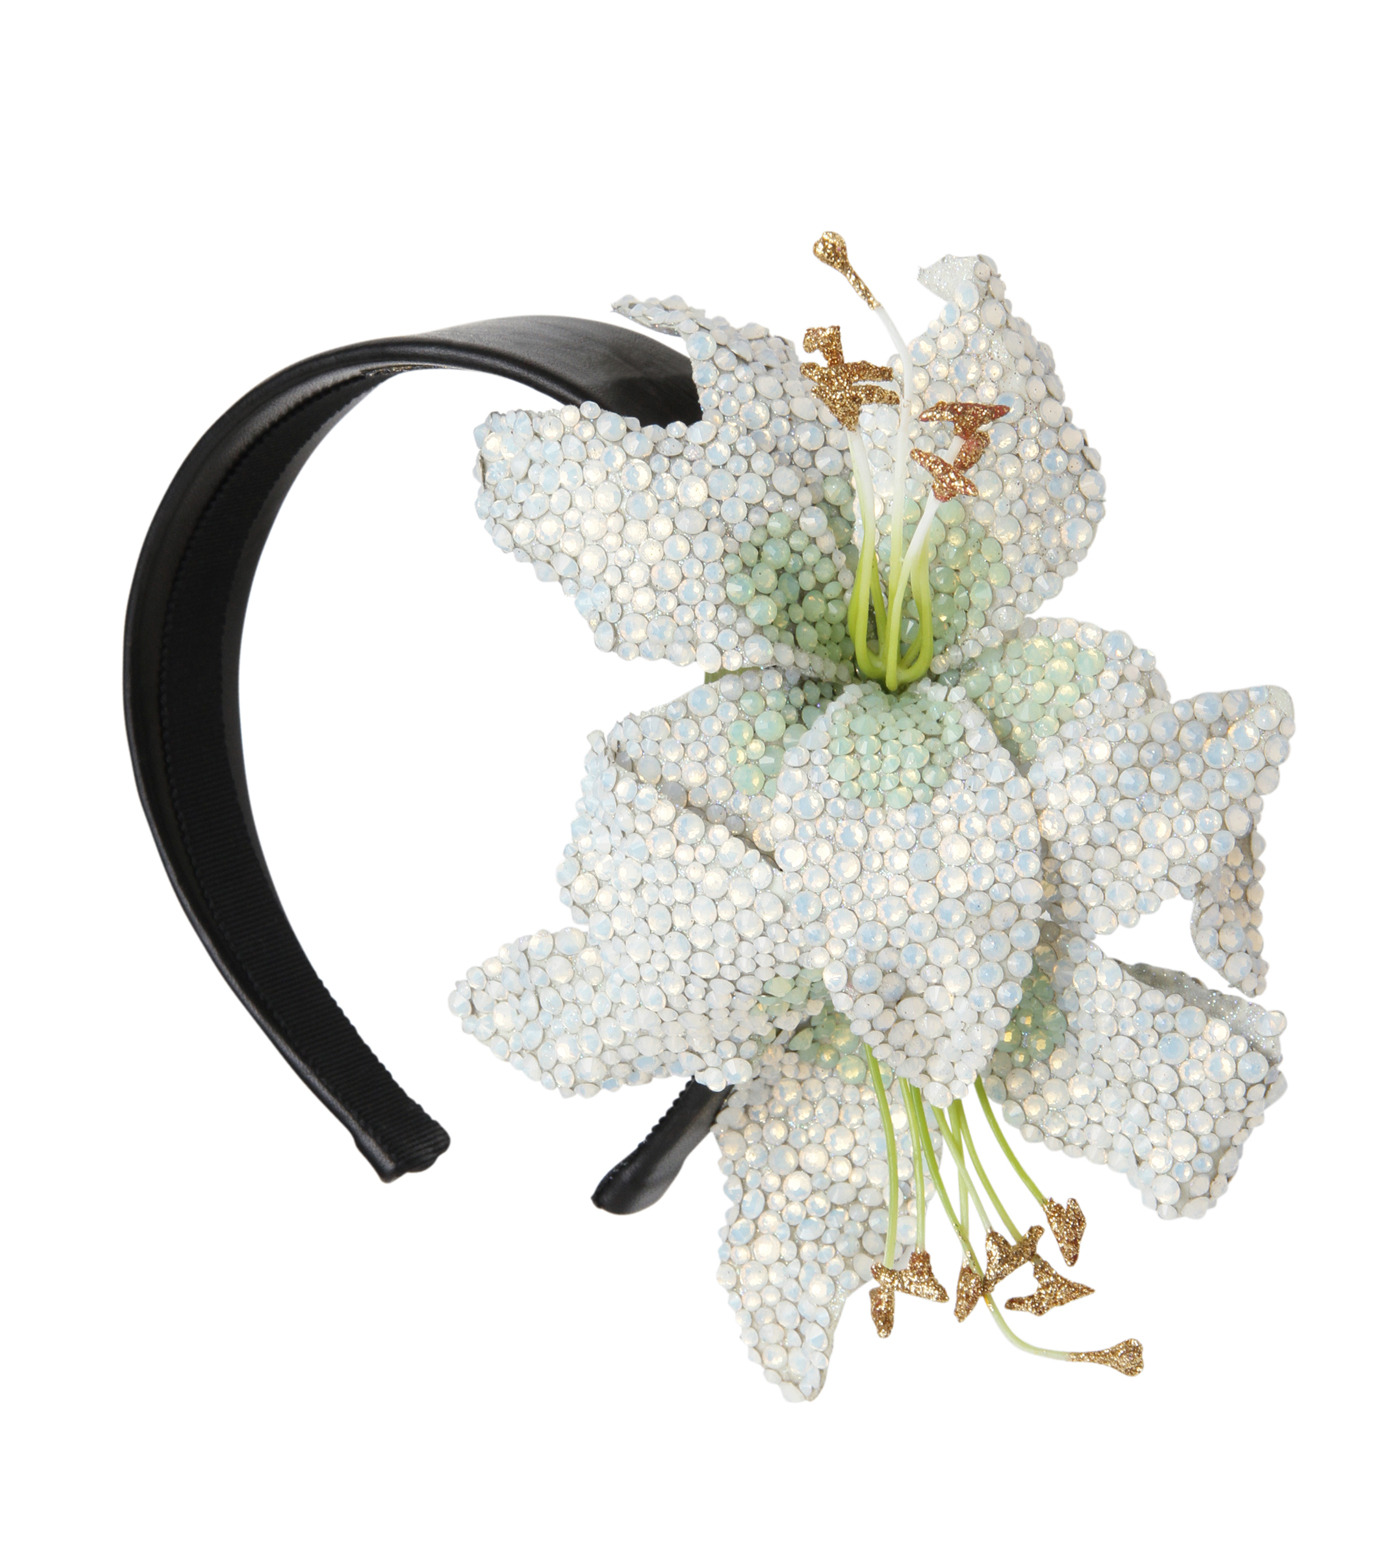 Piers Atkinson(ピアーズ アトキンソン)のSwarovski Crystal Encrusted Lilyes-WHITE(アクセサリー/accessory)-PA-24-4 拡大詳細画像2